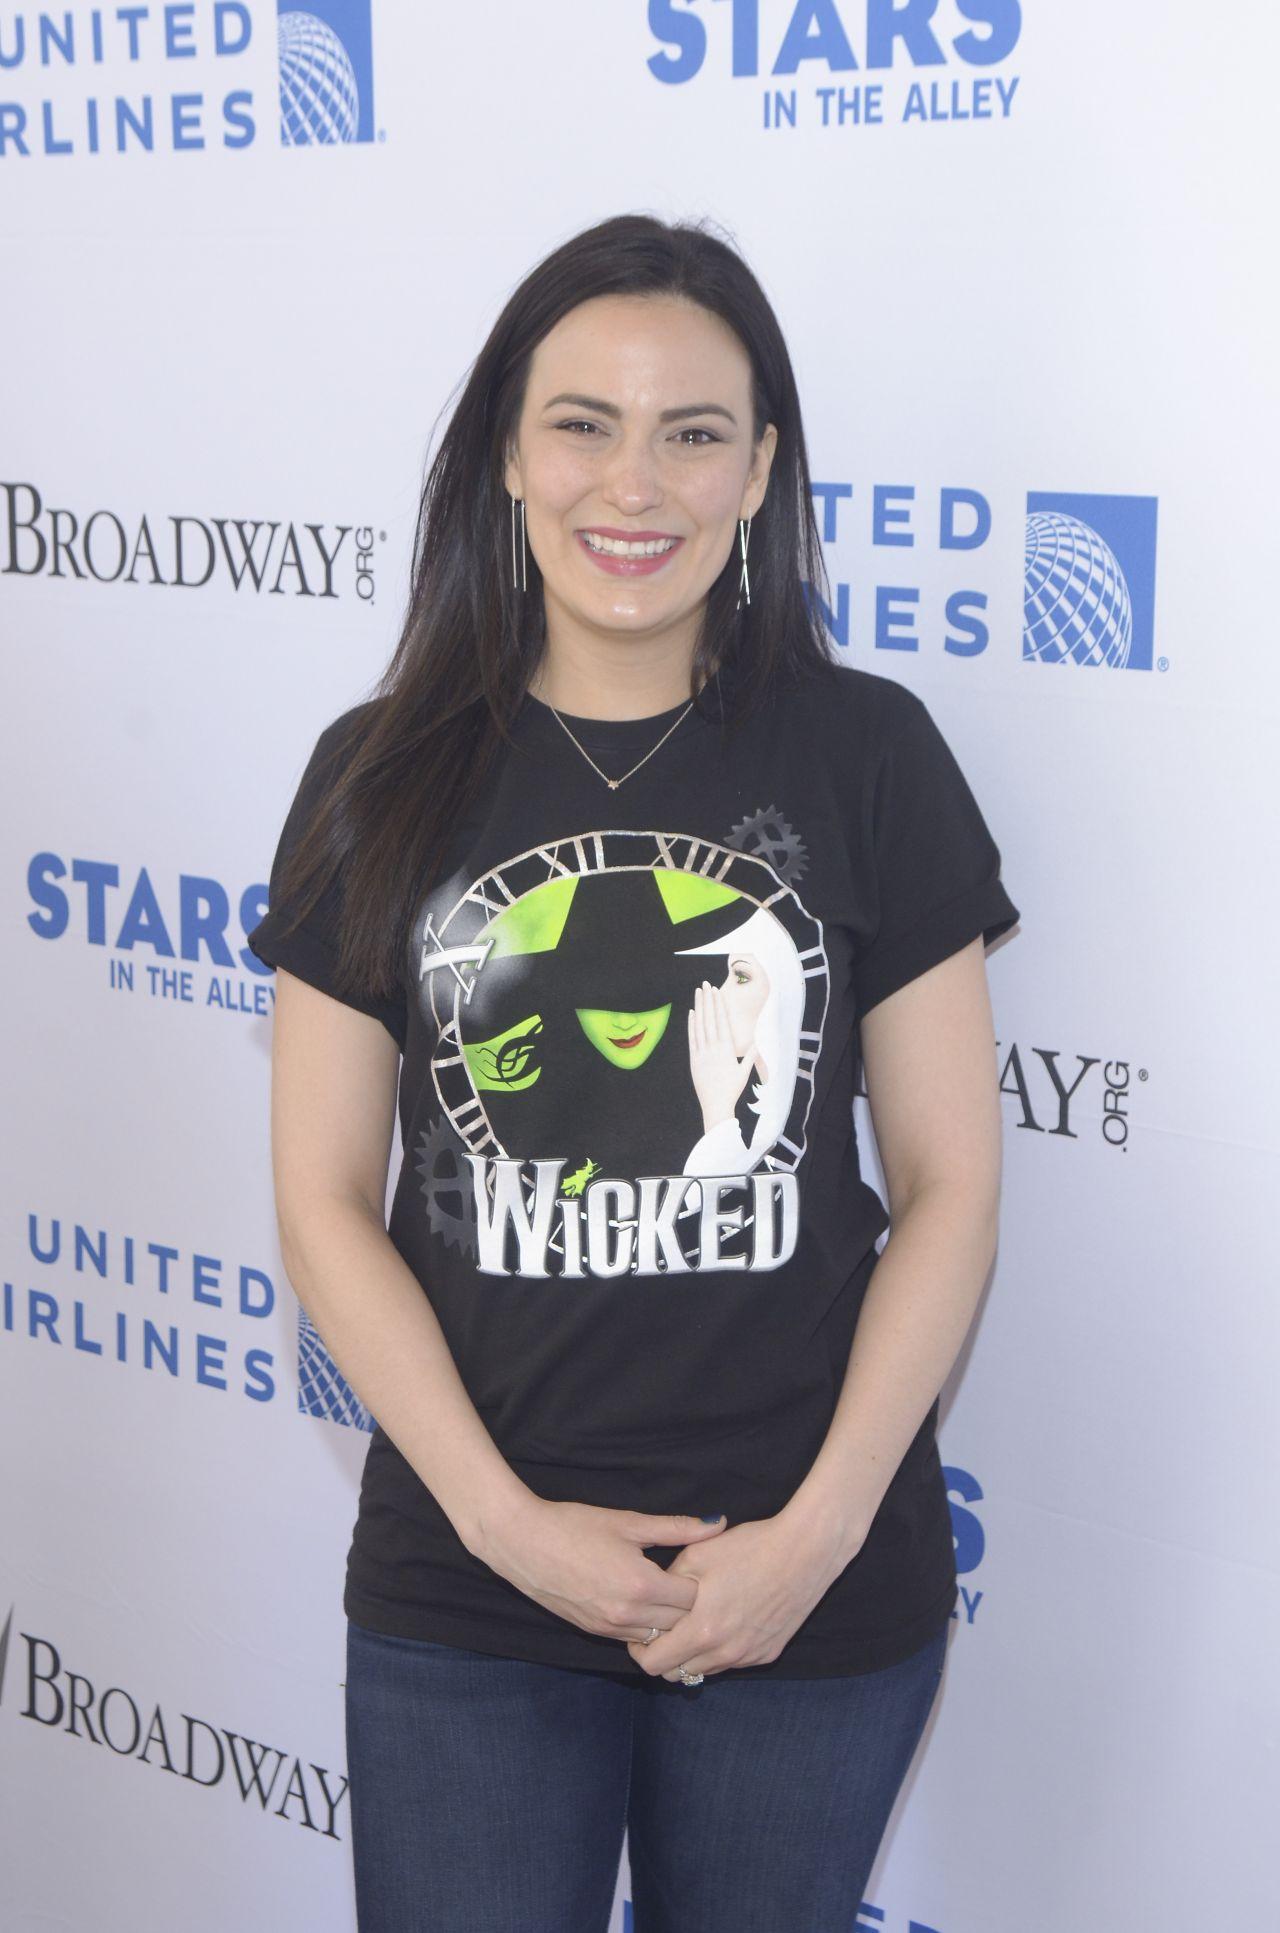 Alyssa fox stars in the alley event in new york